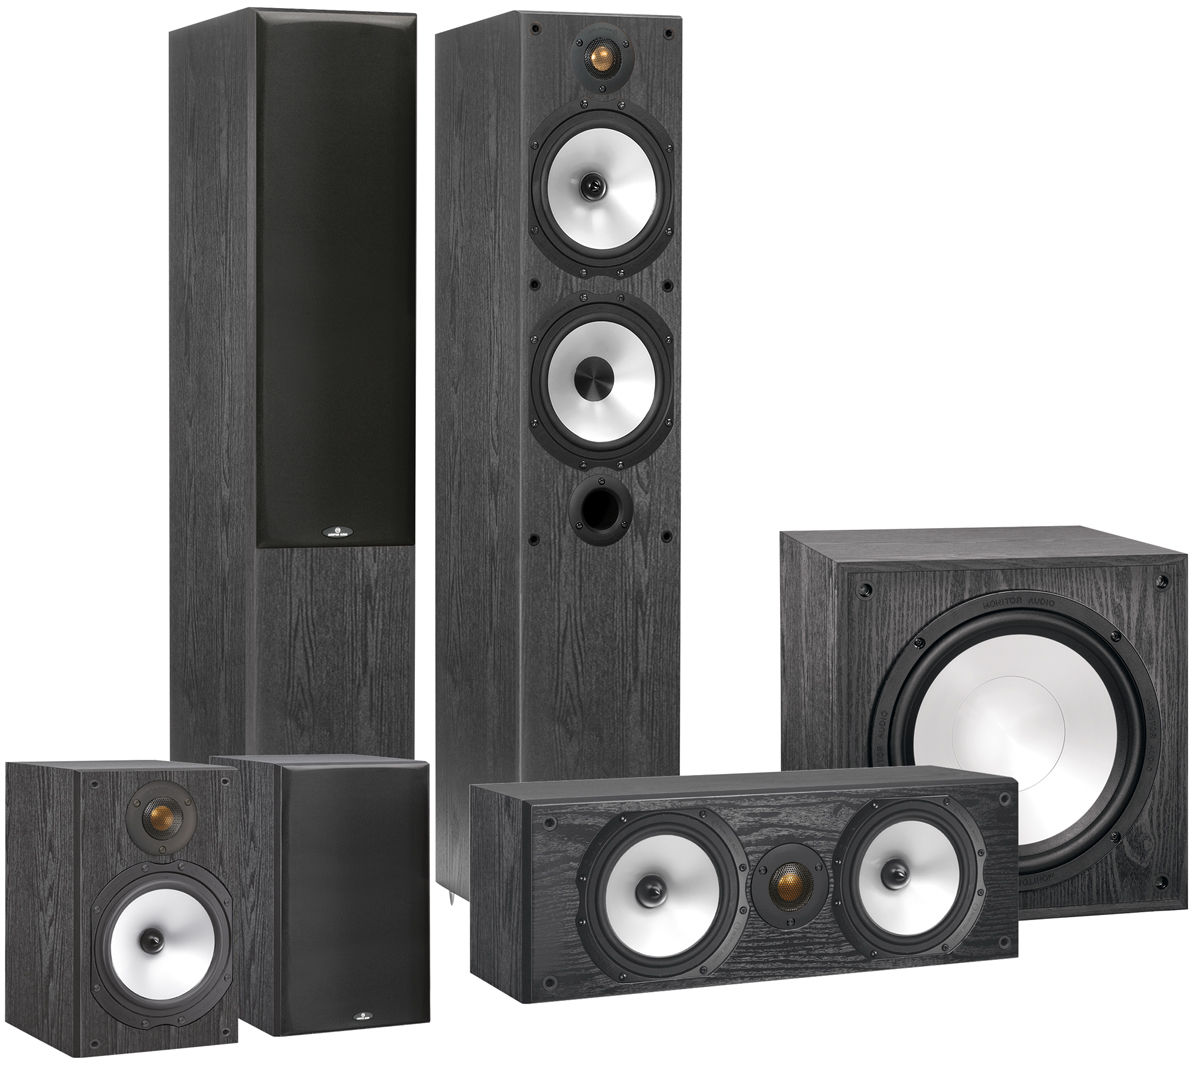 http://www.son-video.com/images/dynamic/Packs_d_enceintes/composes/MONAUDMR4HC51NR/Monitor-Audio-MR4-HC-5-1-Noir_P_1200.jpg